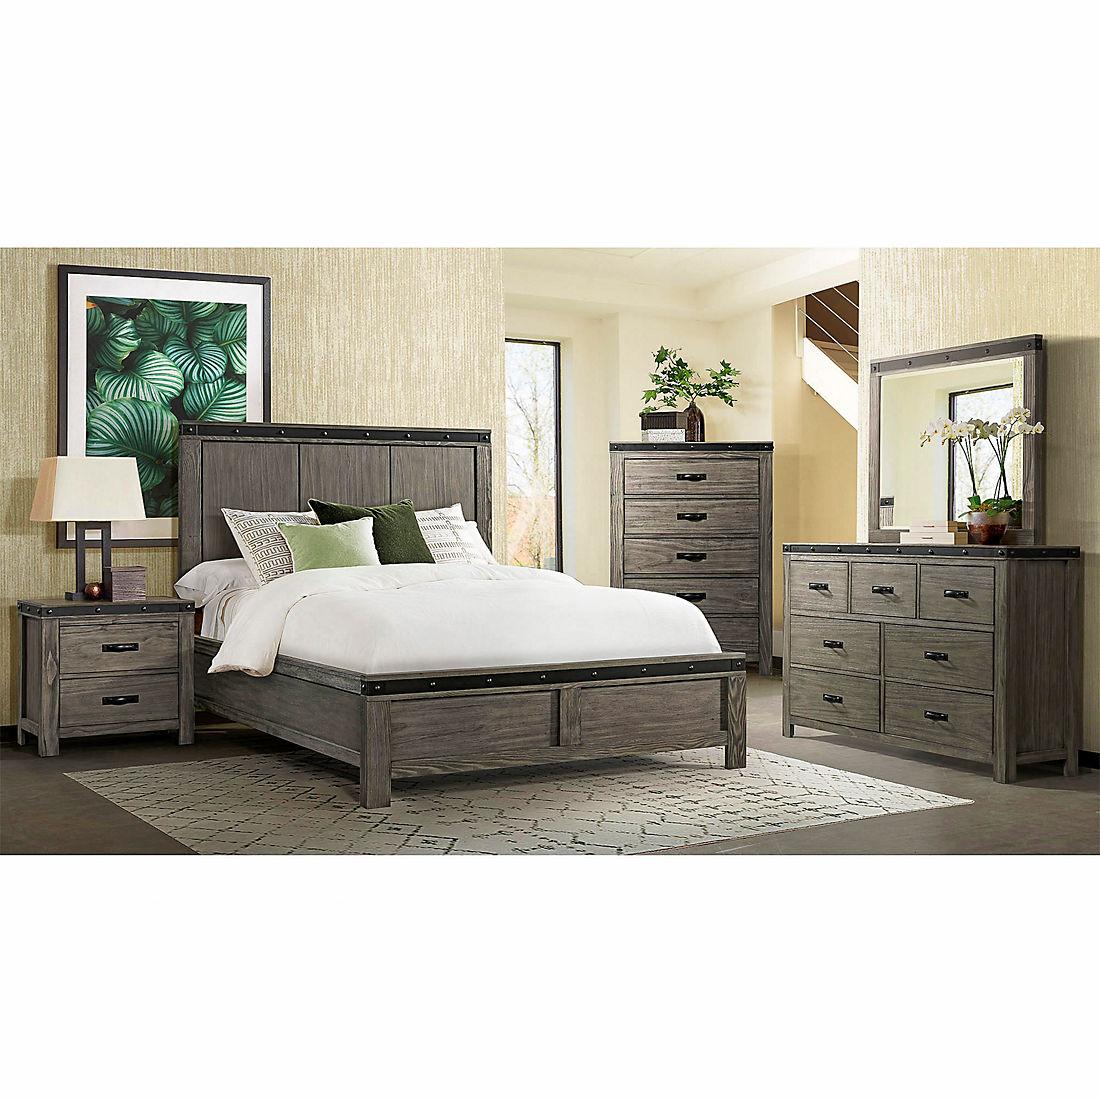 Sullivan 5 Pc Queen Size Panel Bedroom Set Gray Bjs Wholesale Club